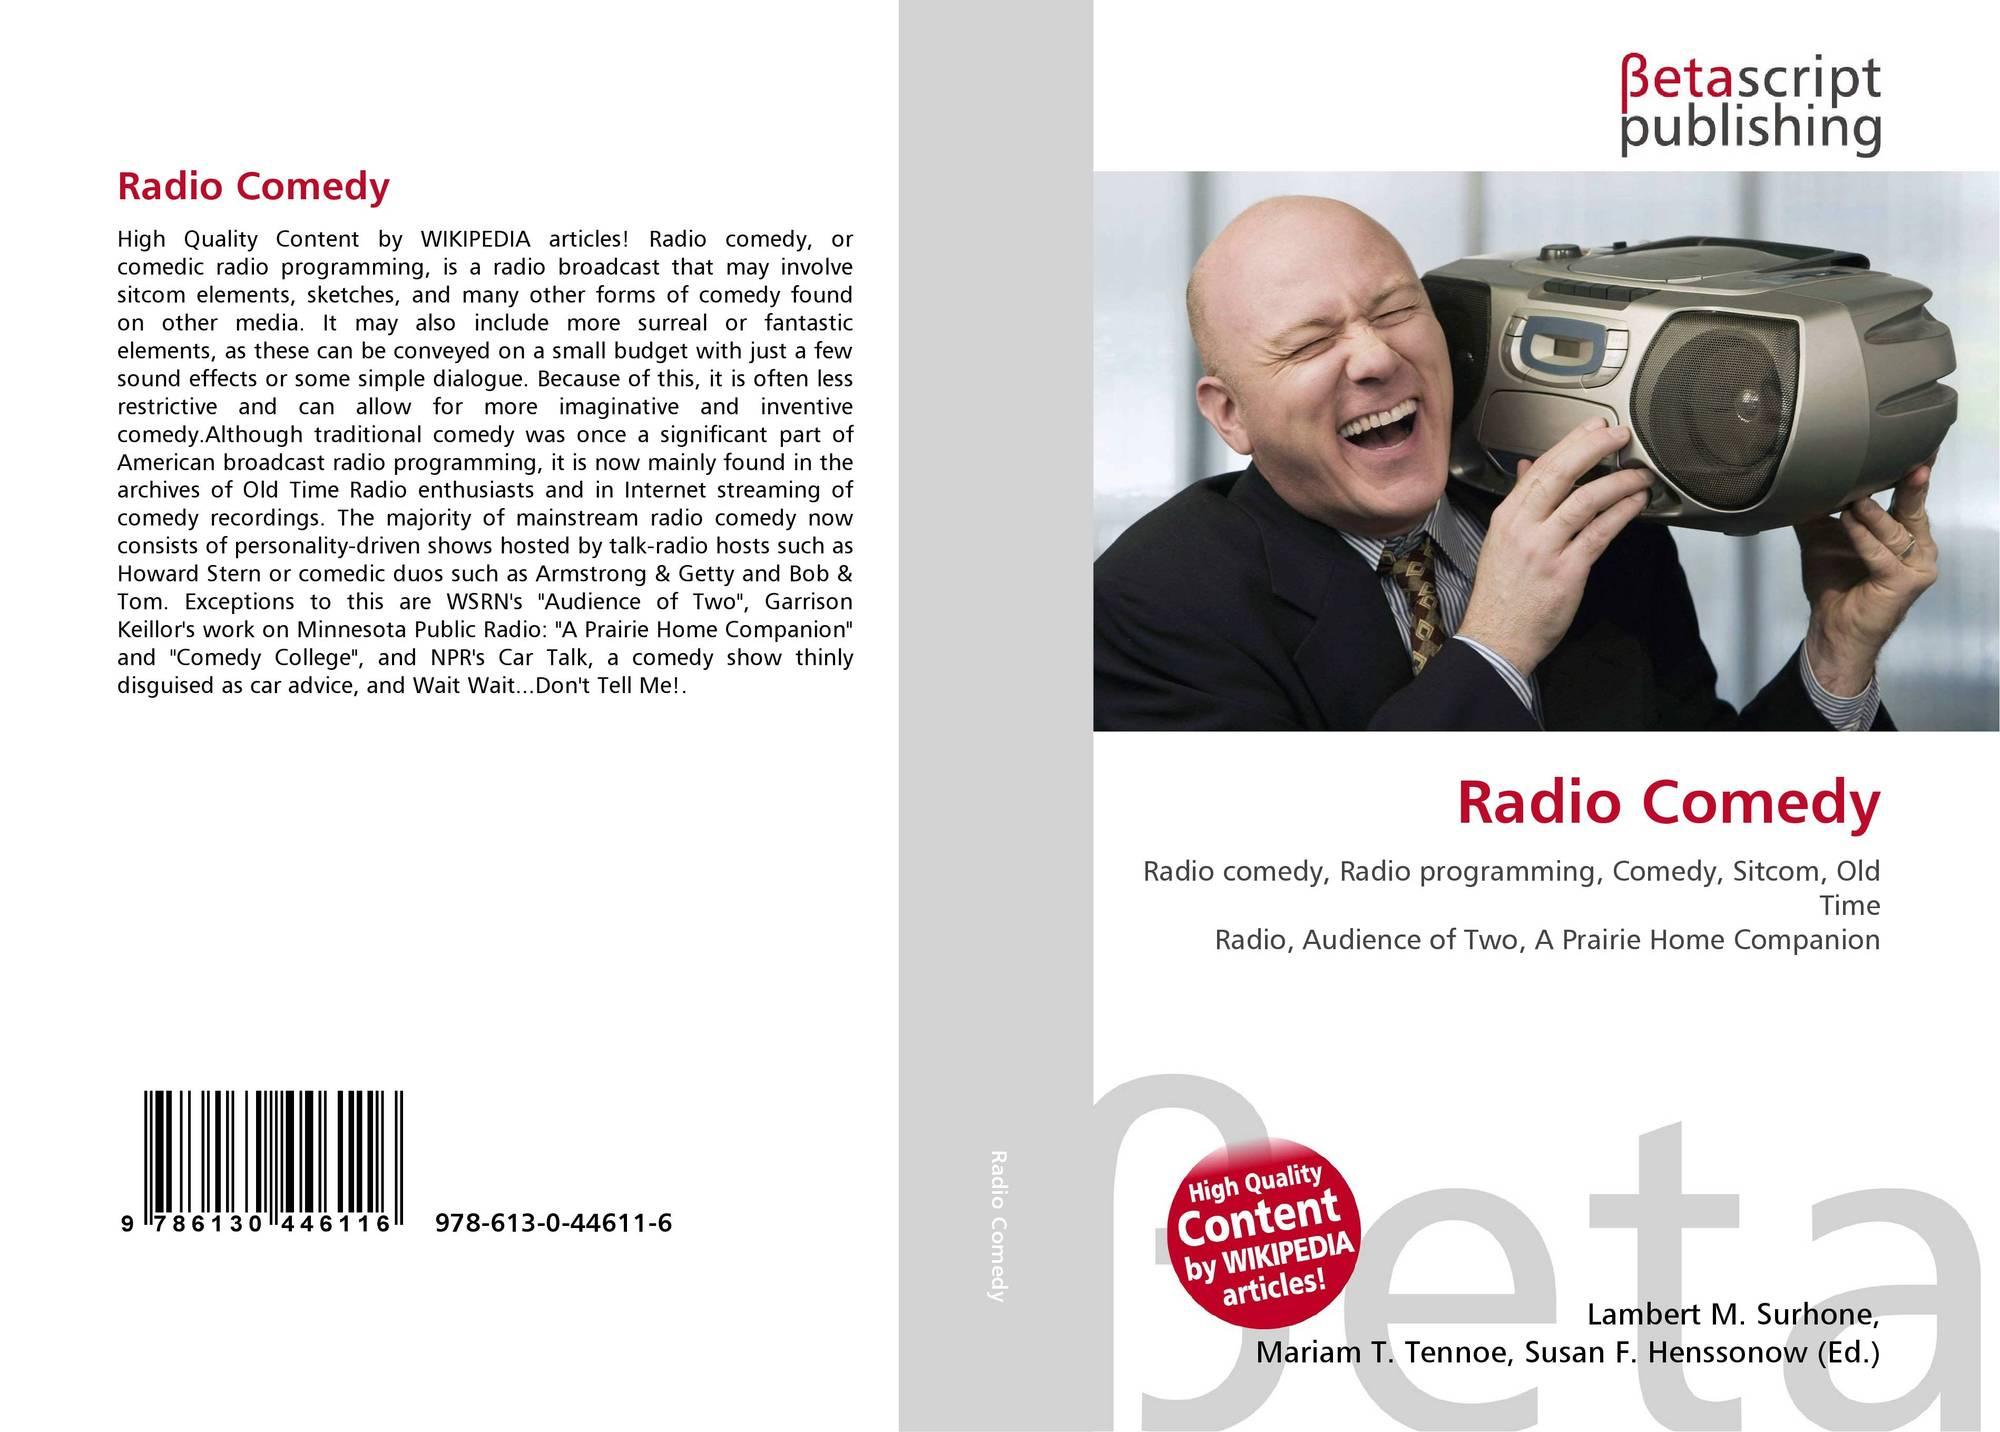 Radio Comedy, 978-613-0-44611-6, 613044611X ,9786130446116